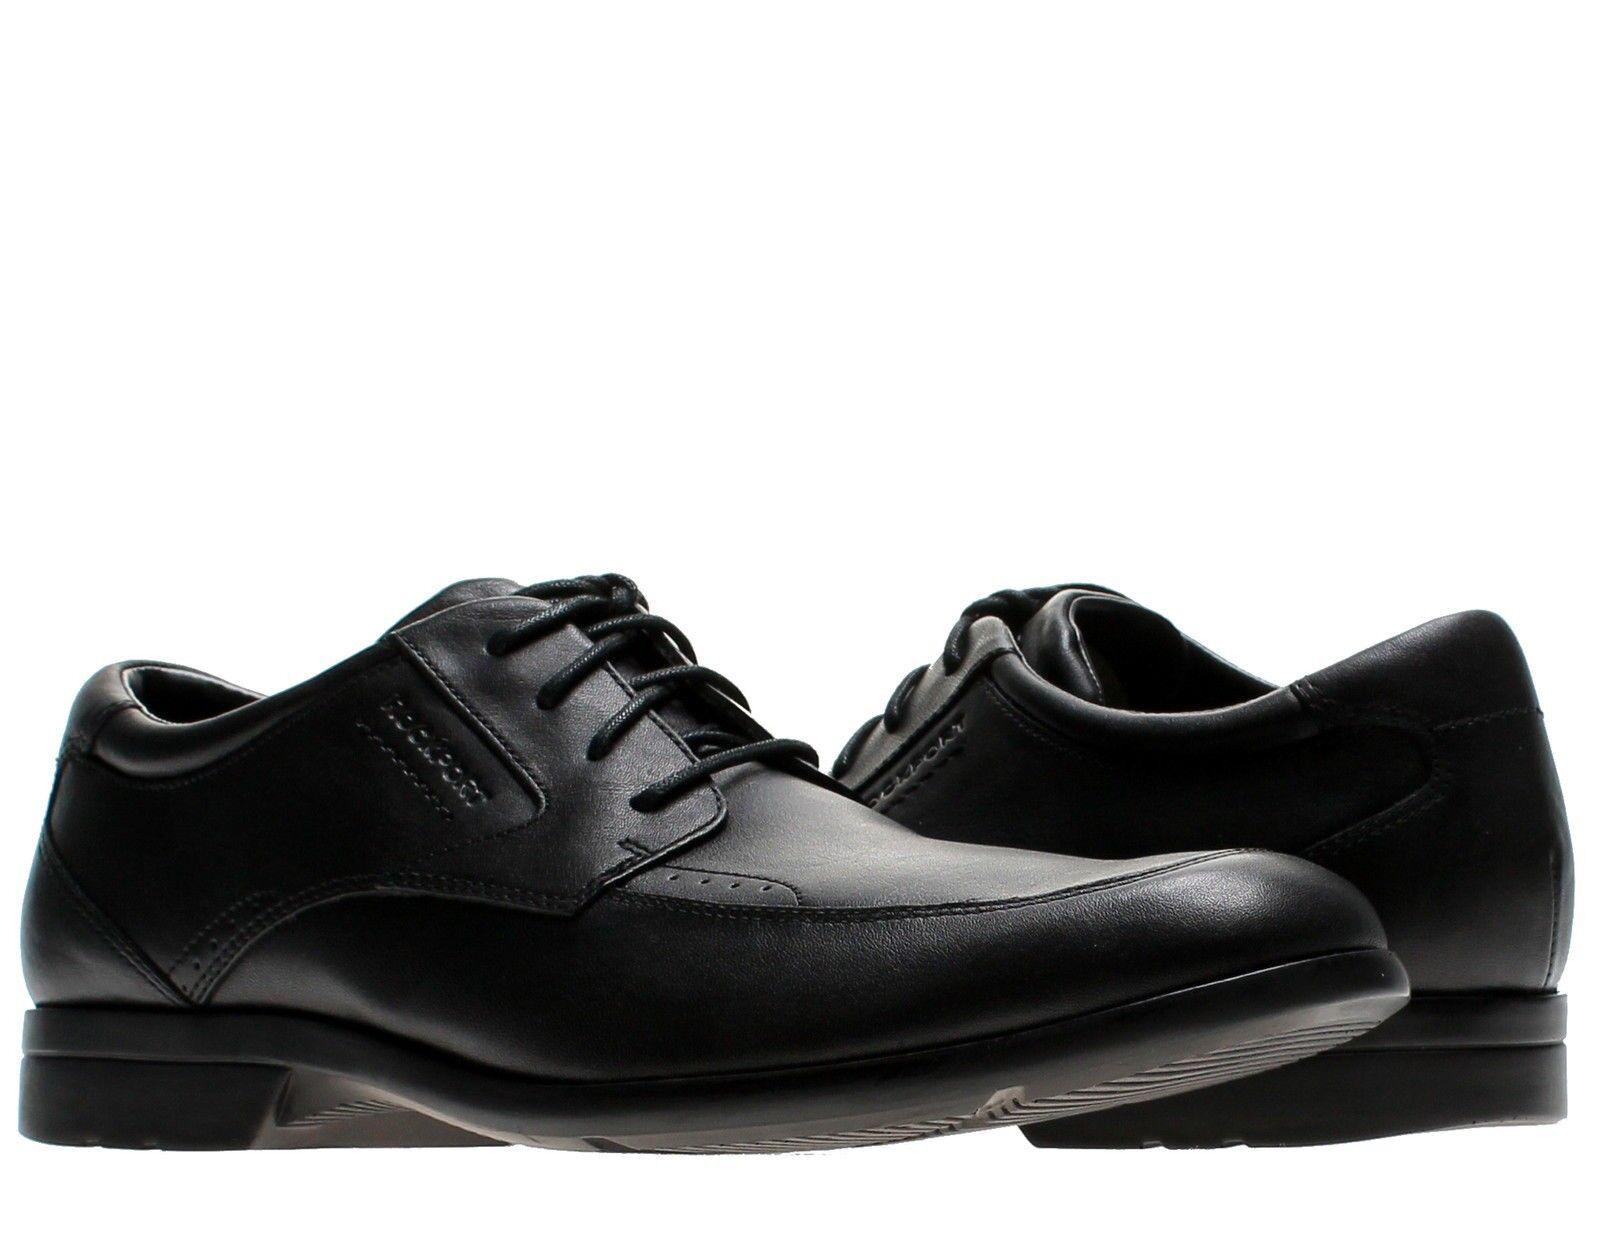 NEW  ROCKPORT k62740 Business Lite Moc Toe Mens Leather oXFORD DRESS CASAUL